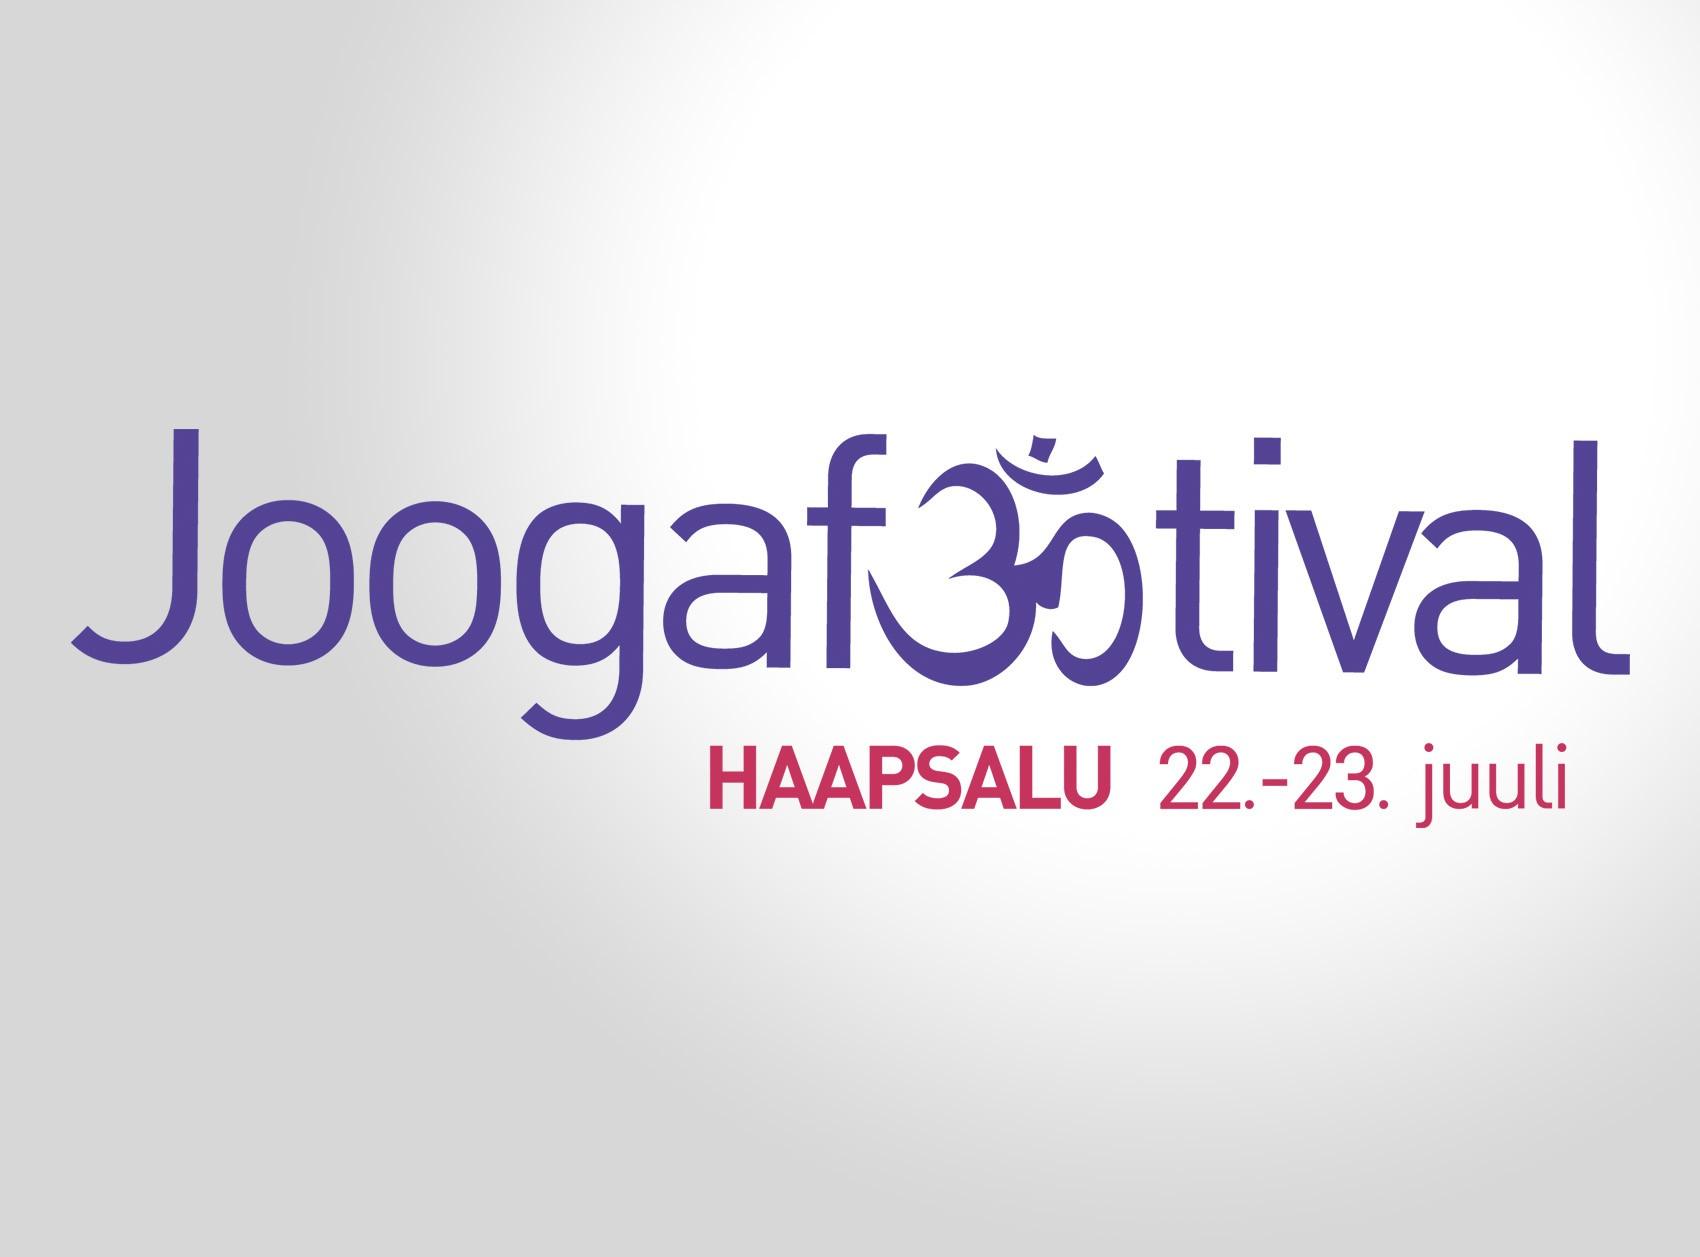 Logodisain: Joogafestival